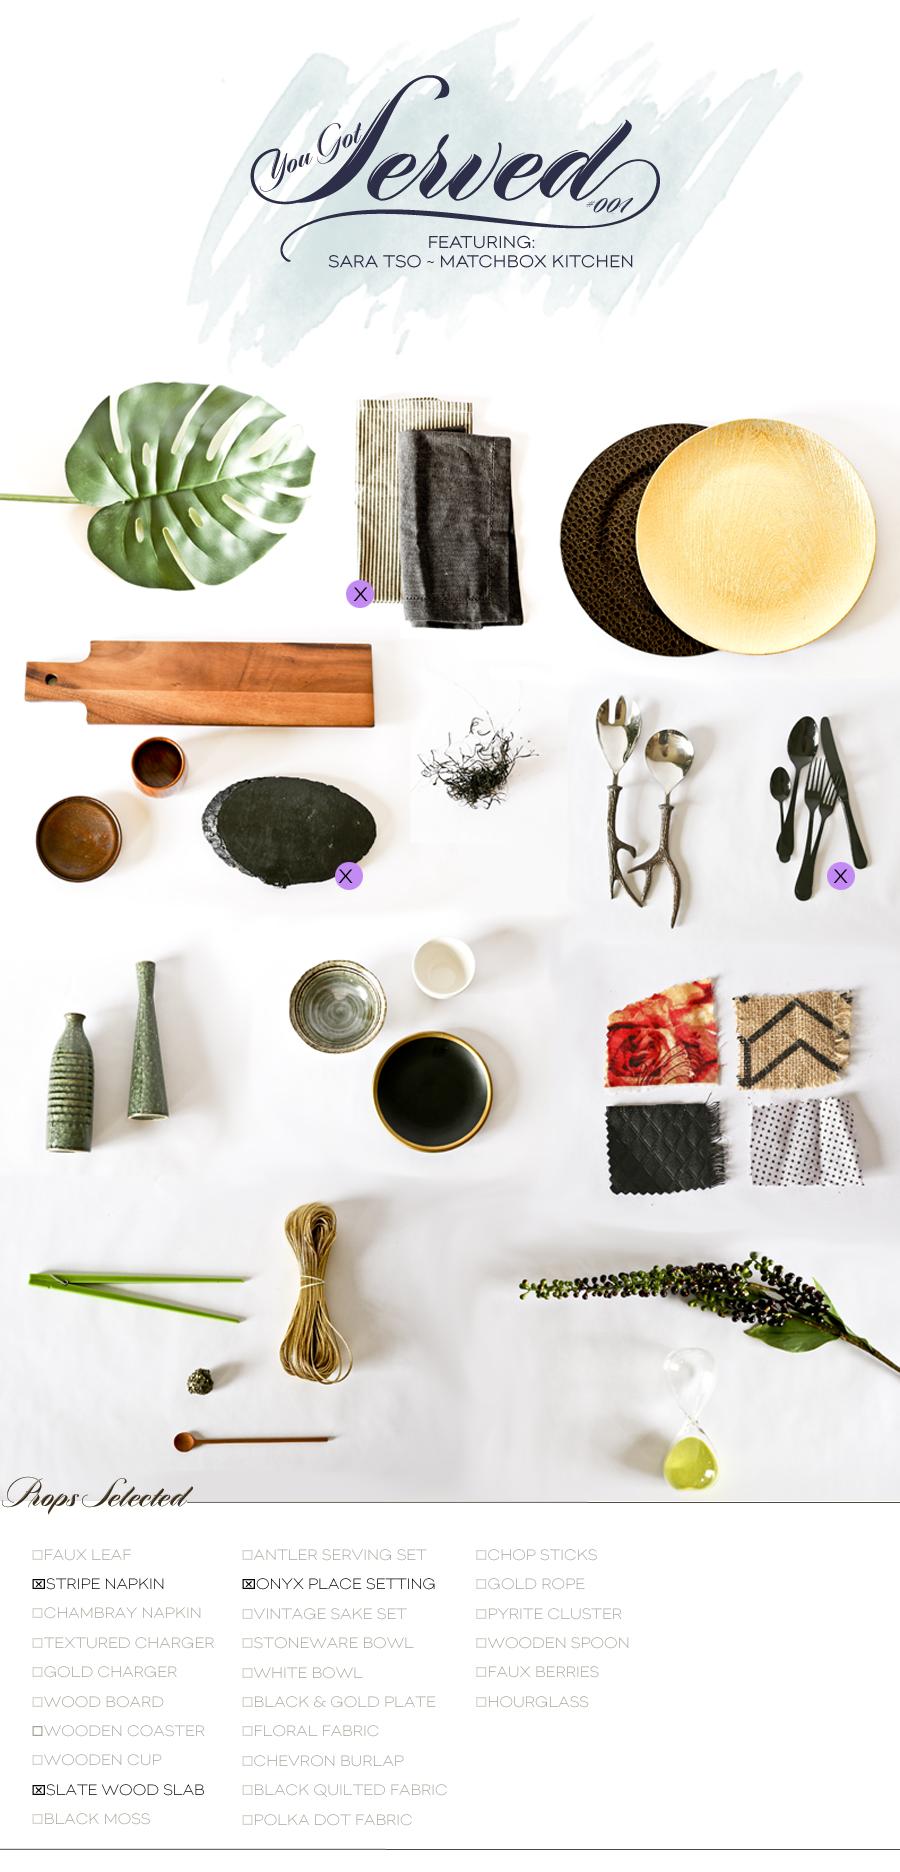 You Got Served | Sara Tso | Box 001 | Dine X Design